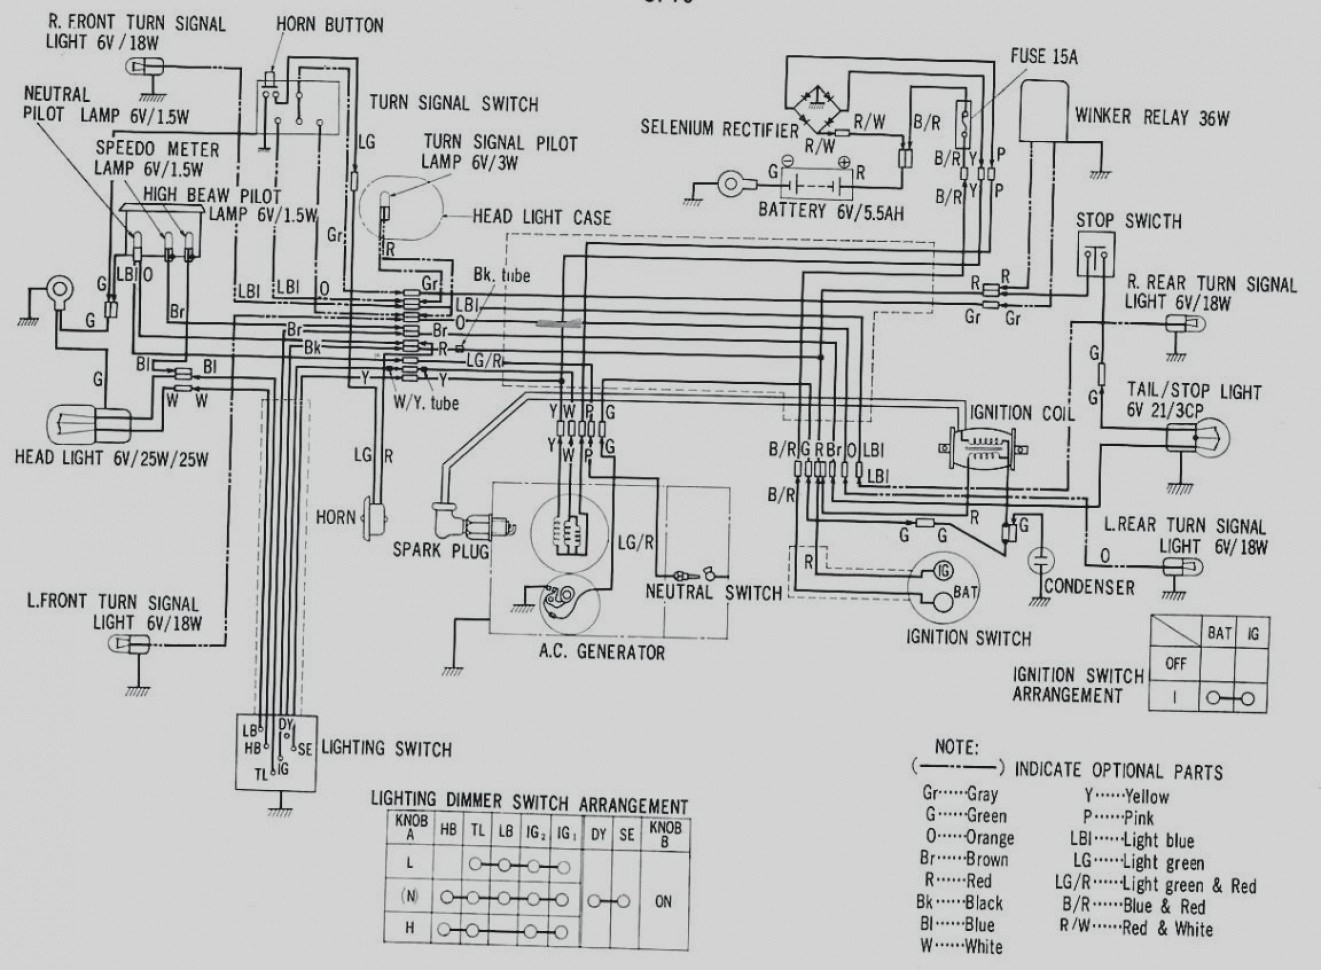 cdi tnn wiring diagram best of